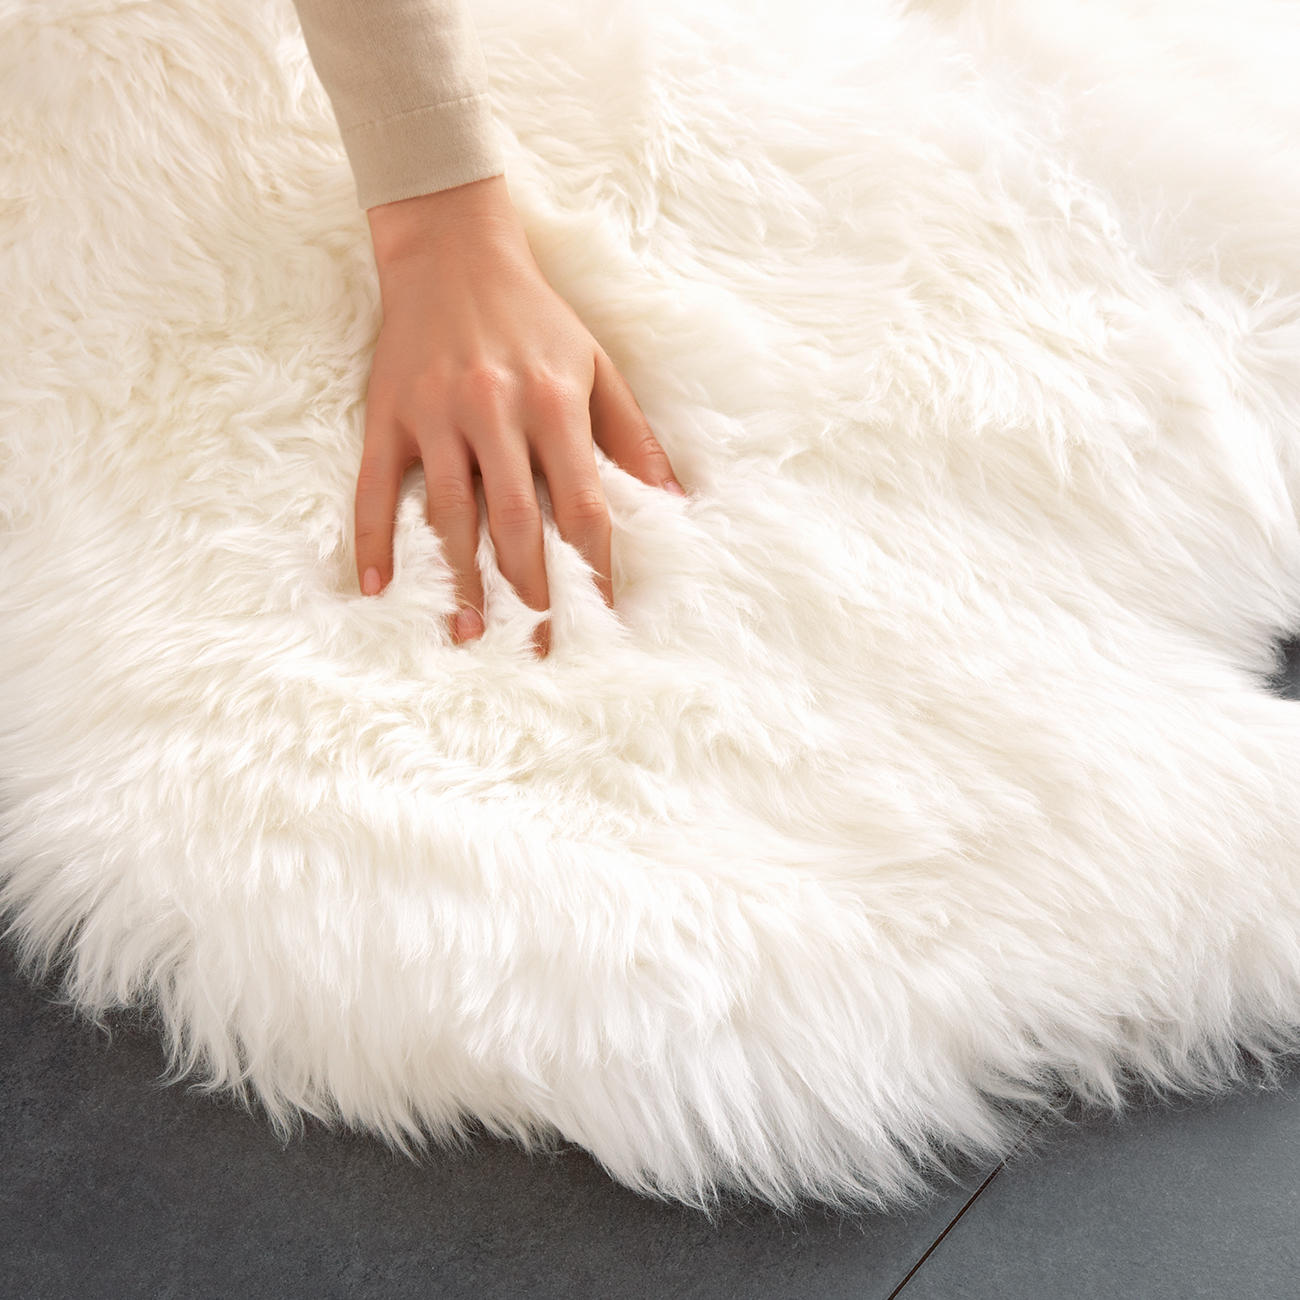 lammfell teppich 160 x 100 cm gross und sogar. Black Bedroom Furniture Sets. Home Design Ideas